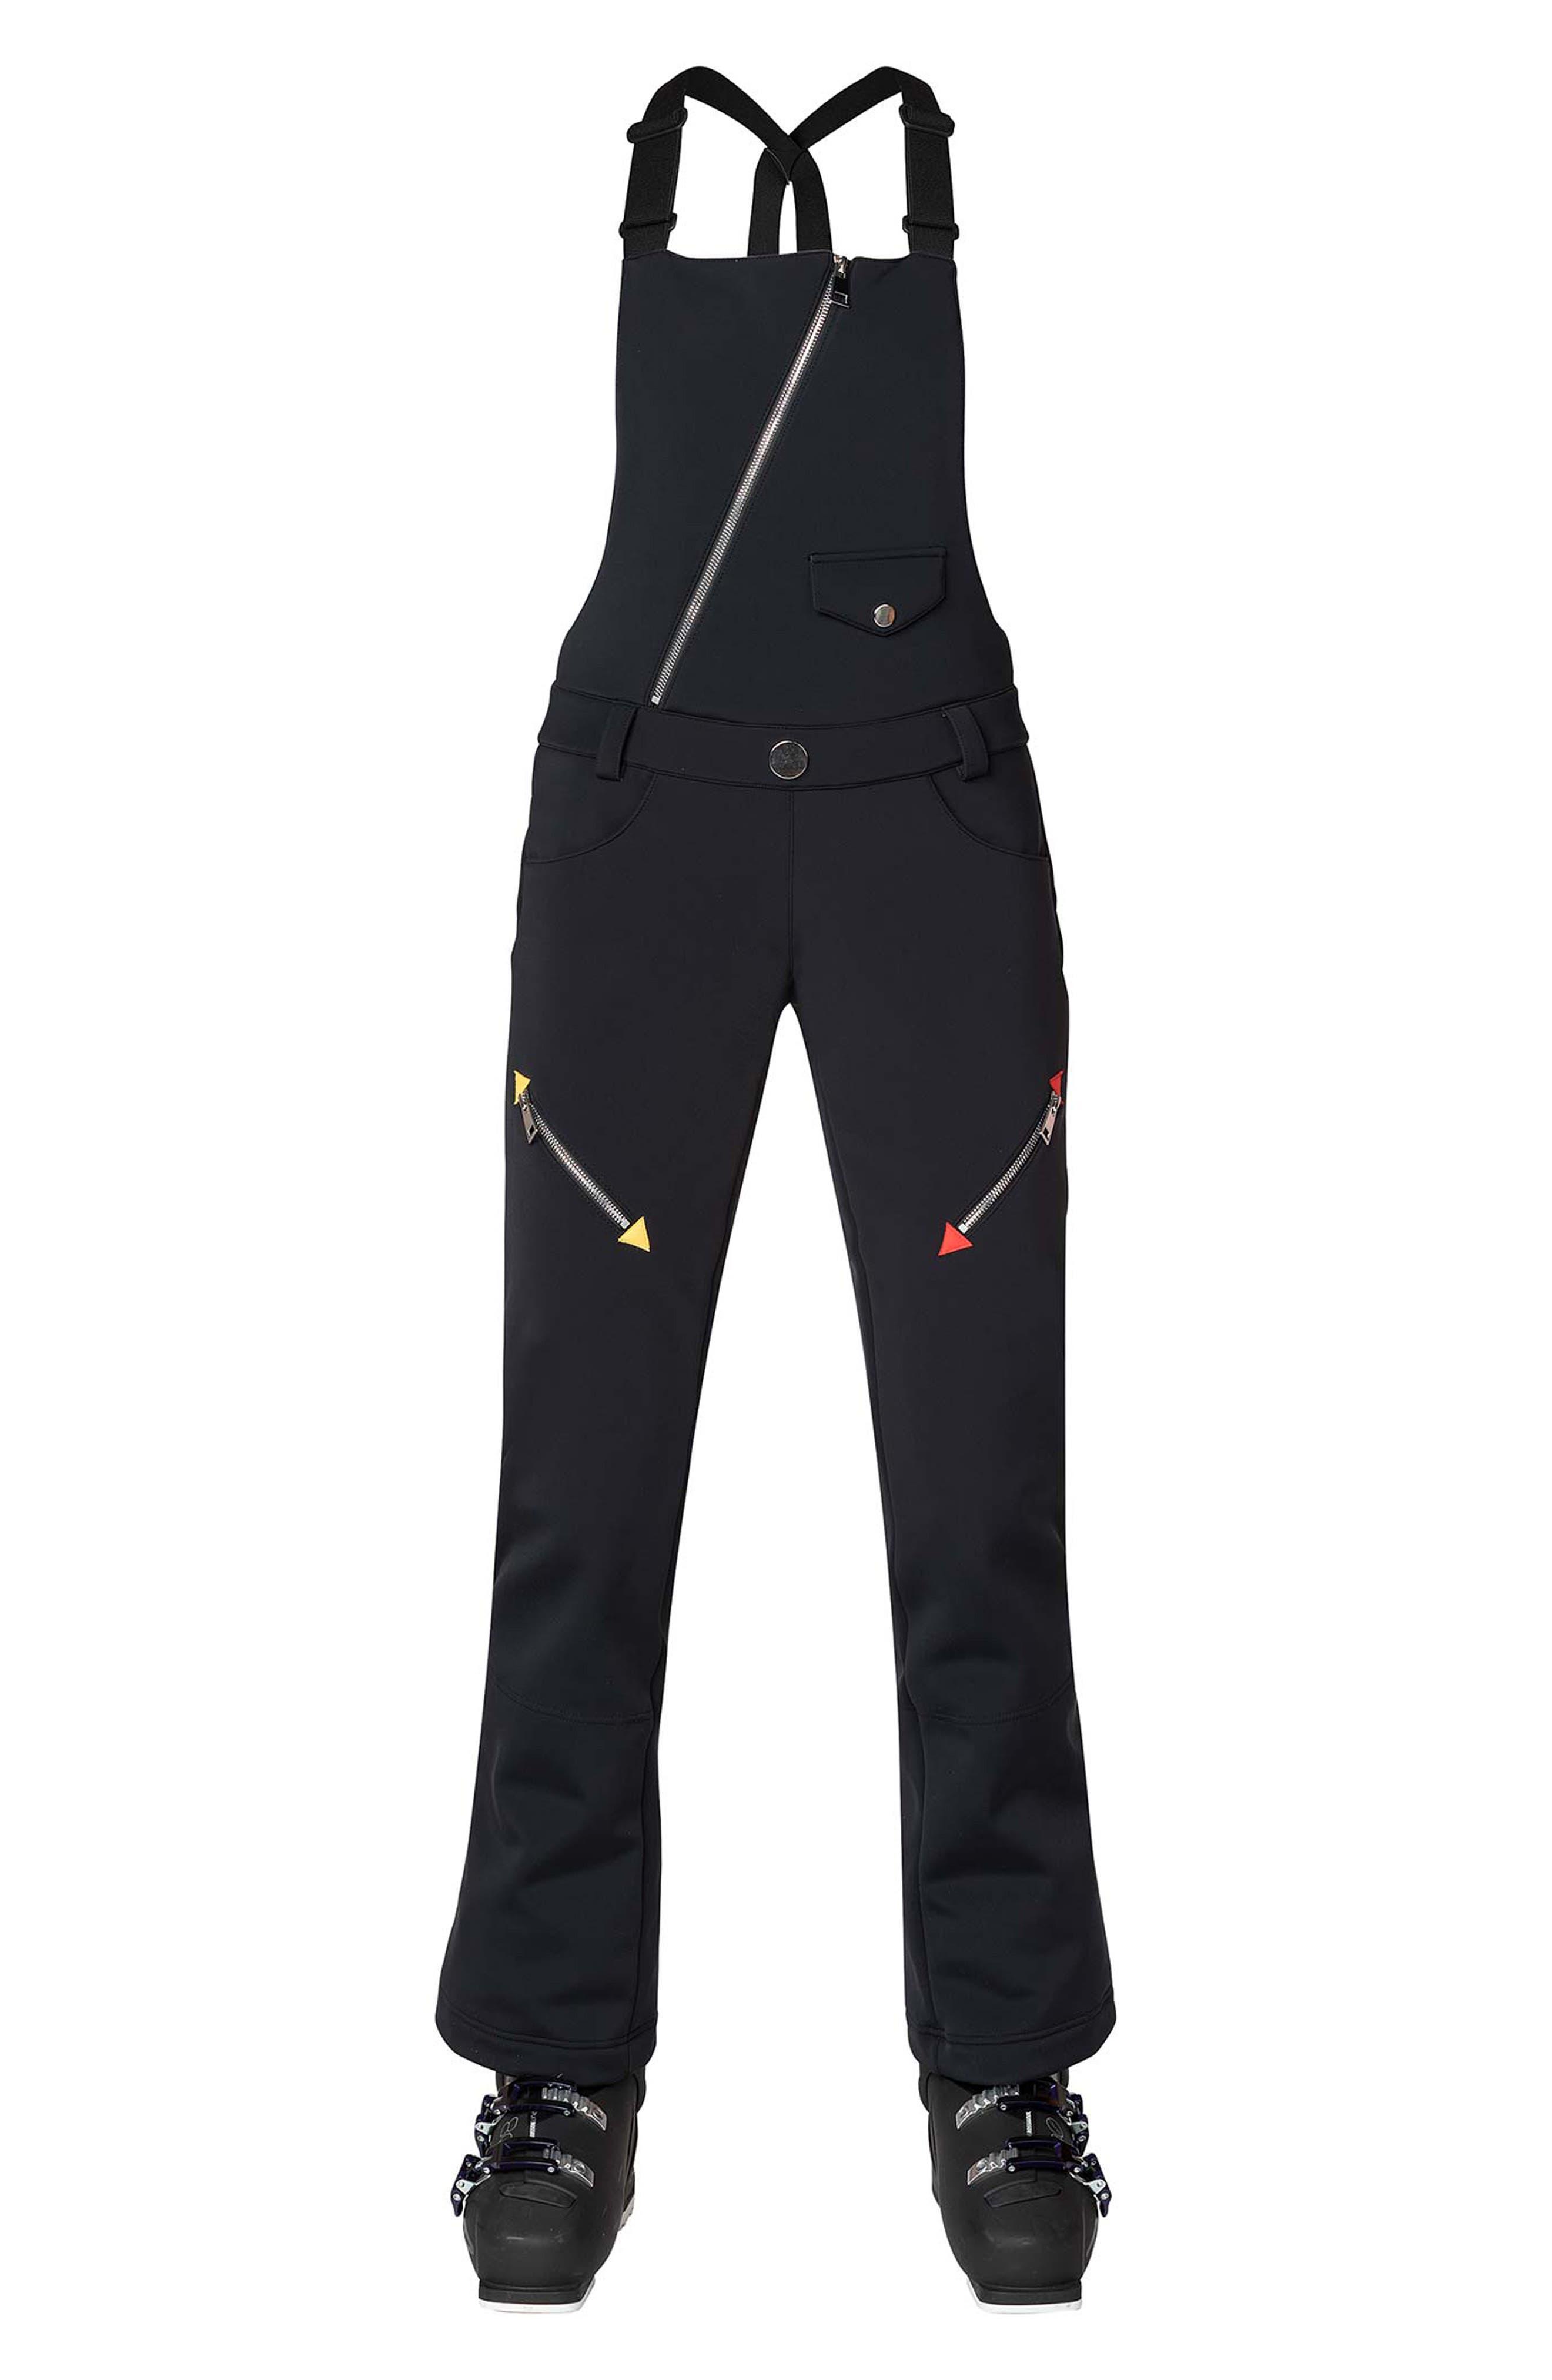 Altirock One-Piece Ski Suit,                             Alternate thumbnail 4, color,                             010